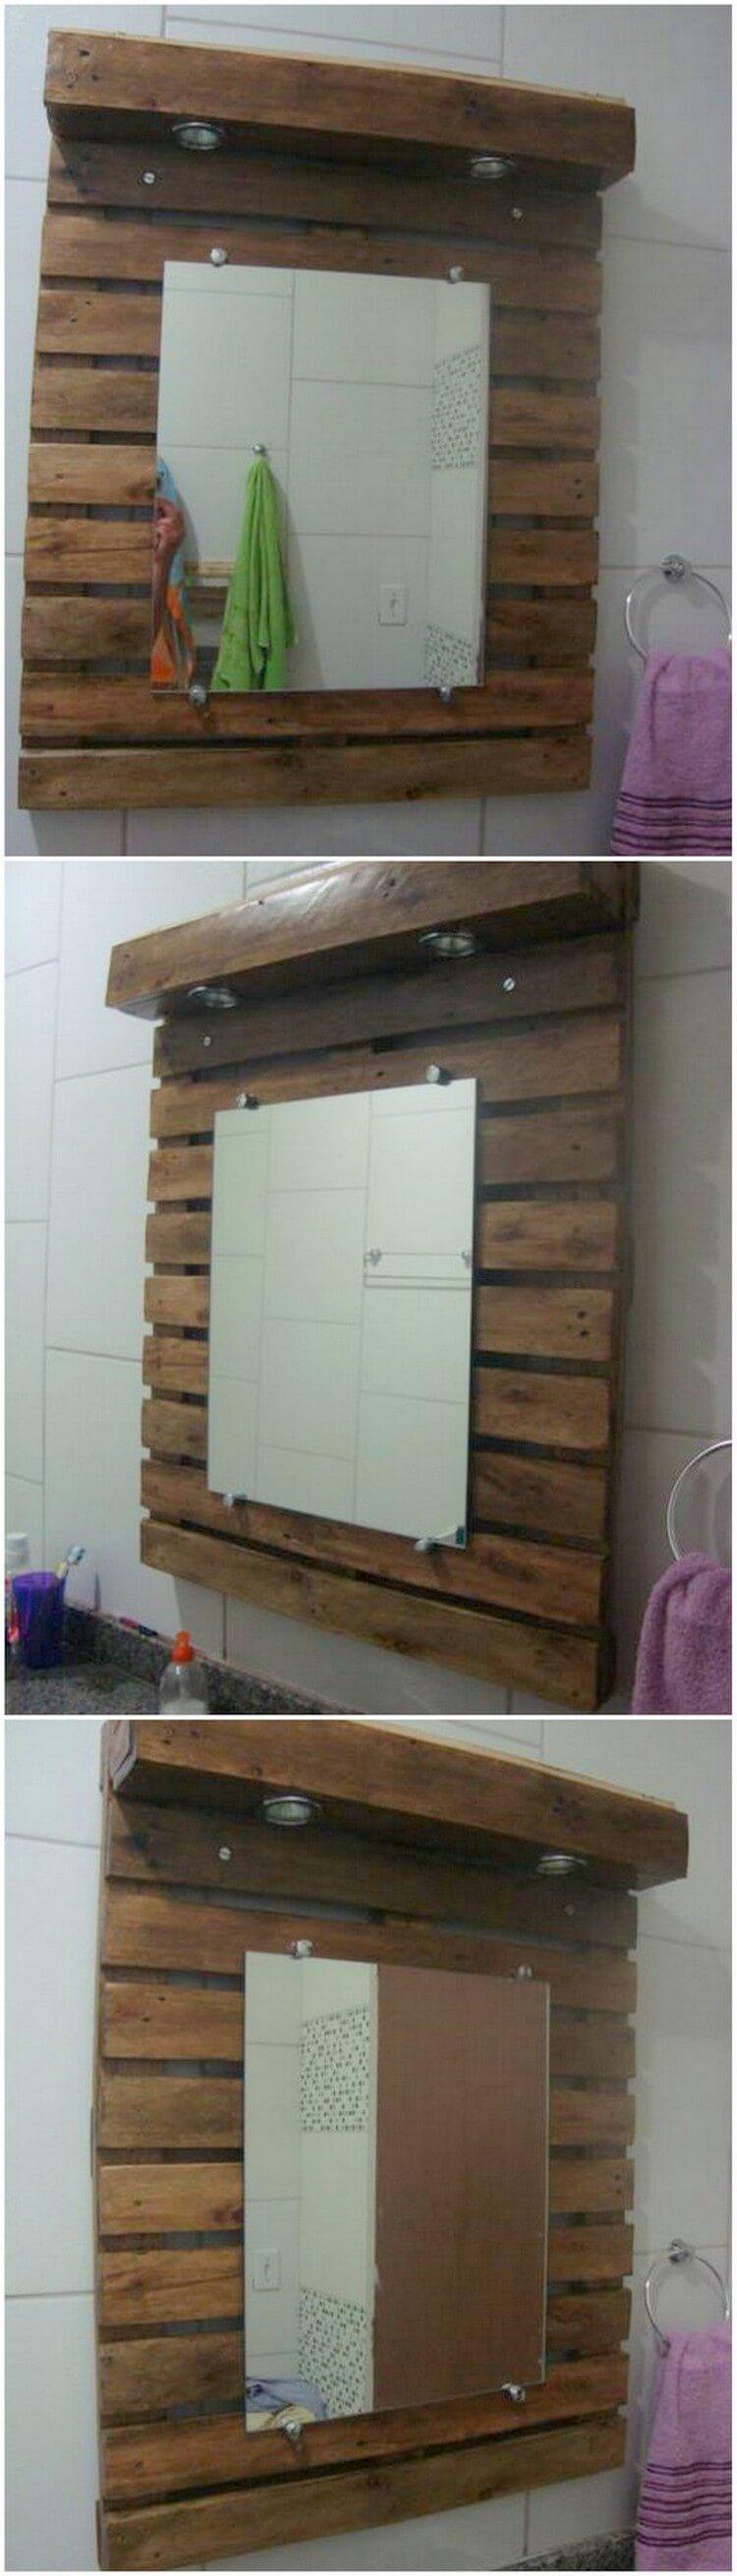 Pallet Vanity Mirror